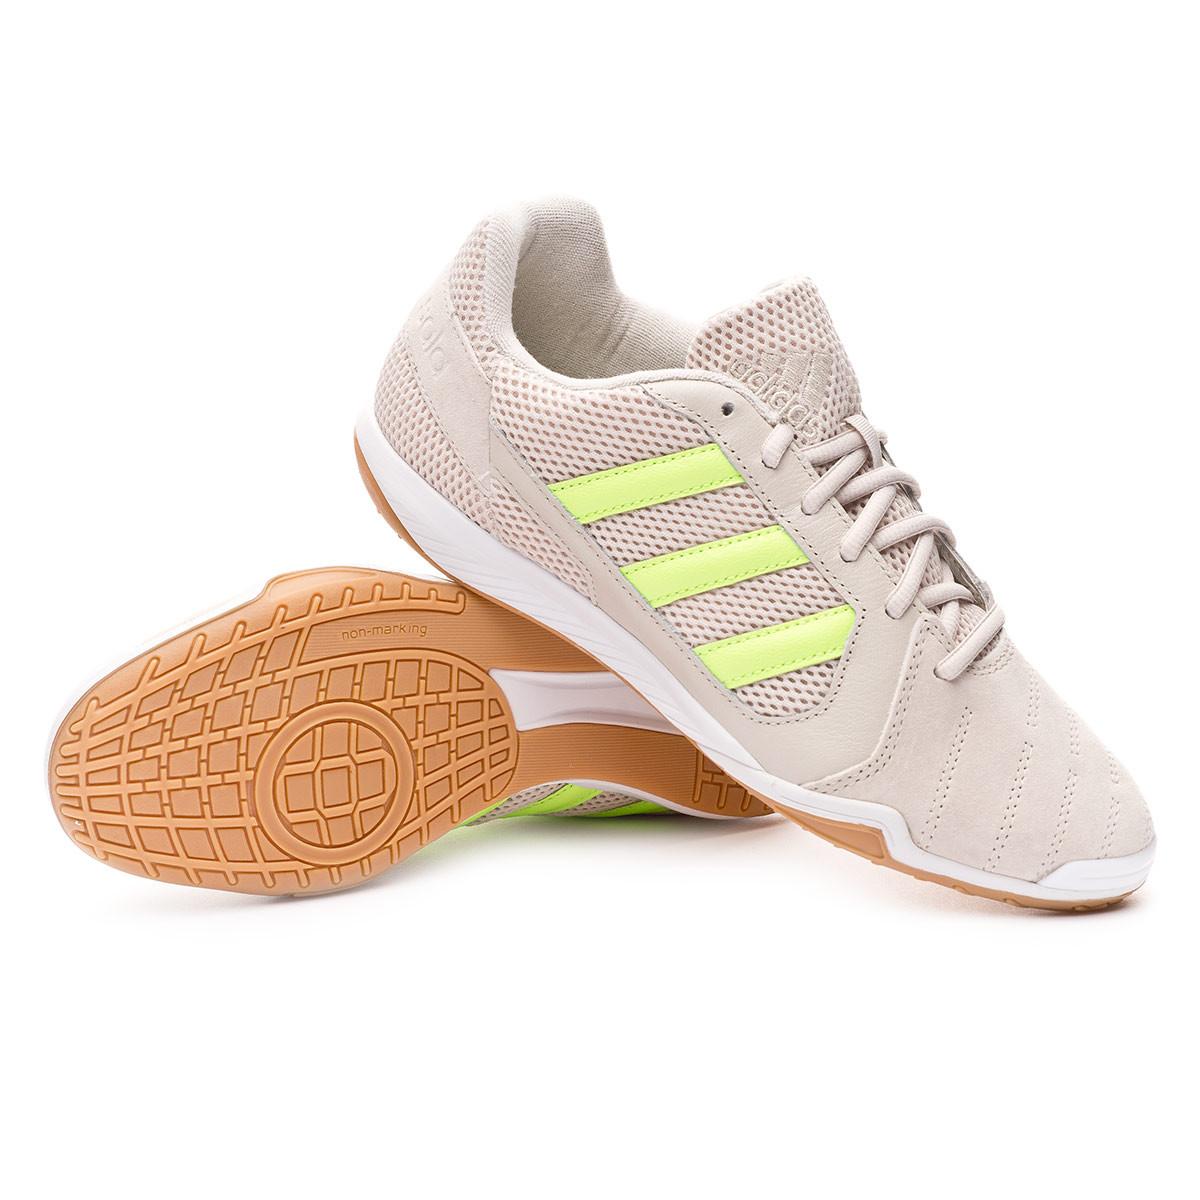 Chaussure de futsal adidas Top Sala Lux